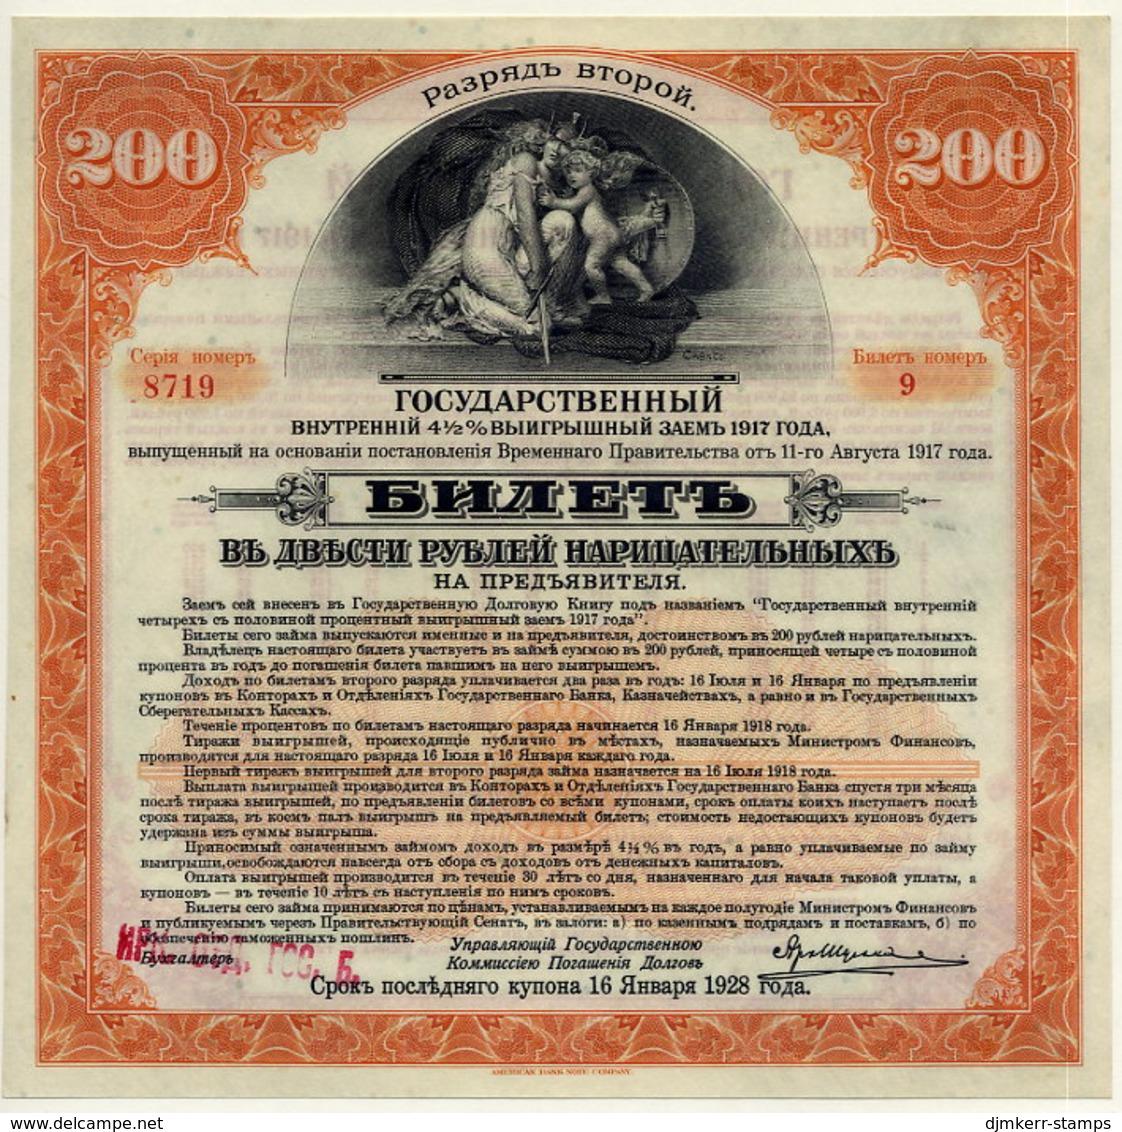 SIBERIA & URALS (Irkutsk) State Bank Loan Note 200 Ruble Orange  UNC  S890 - Russia